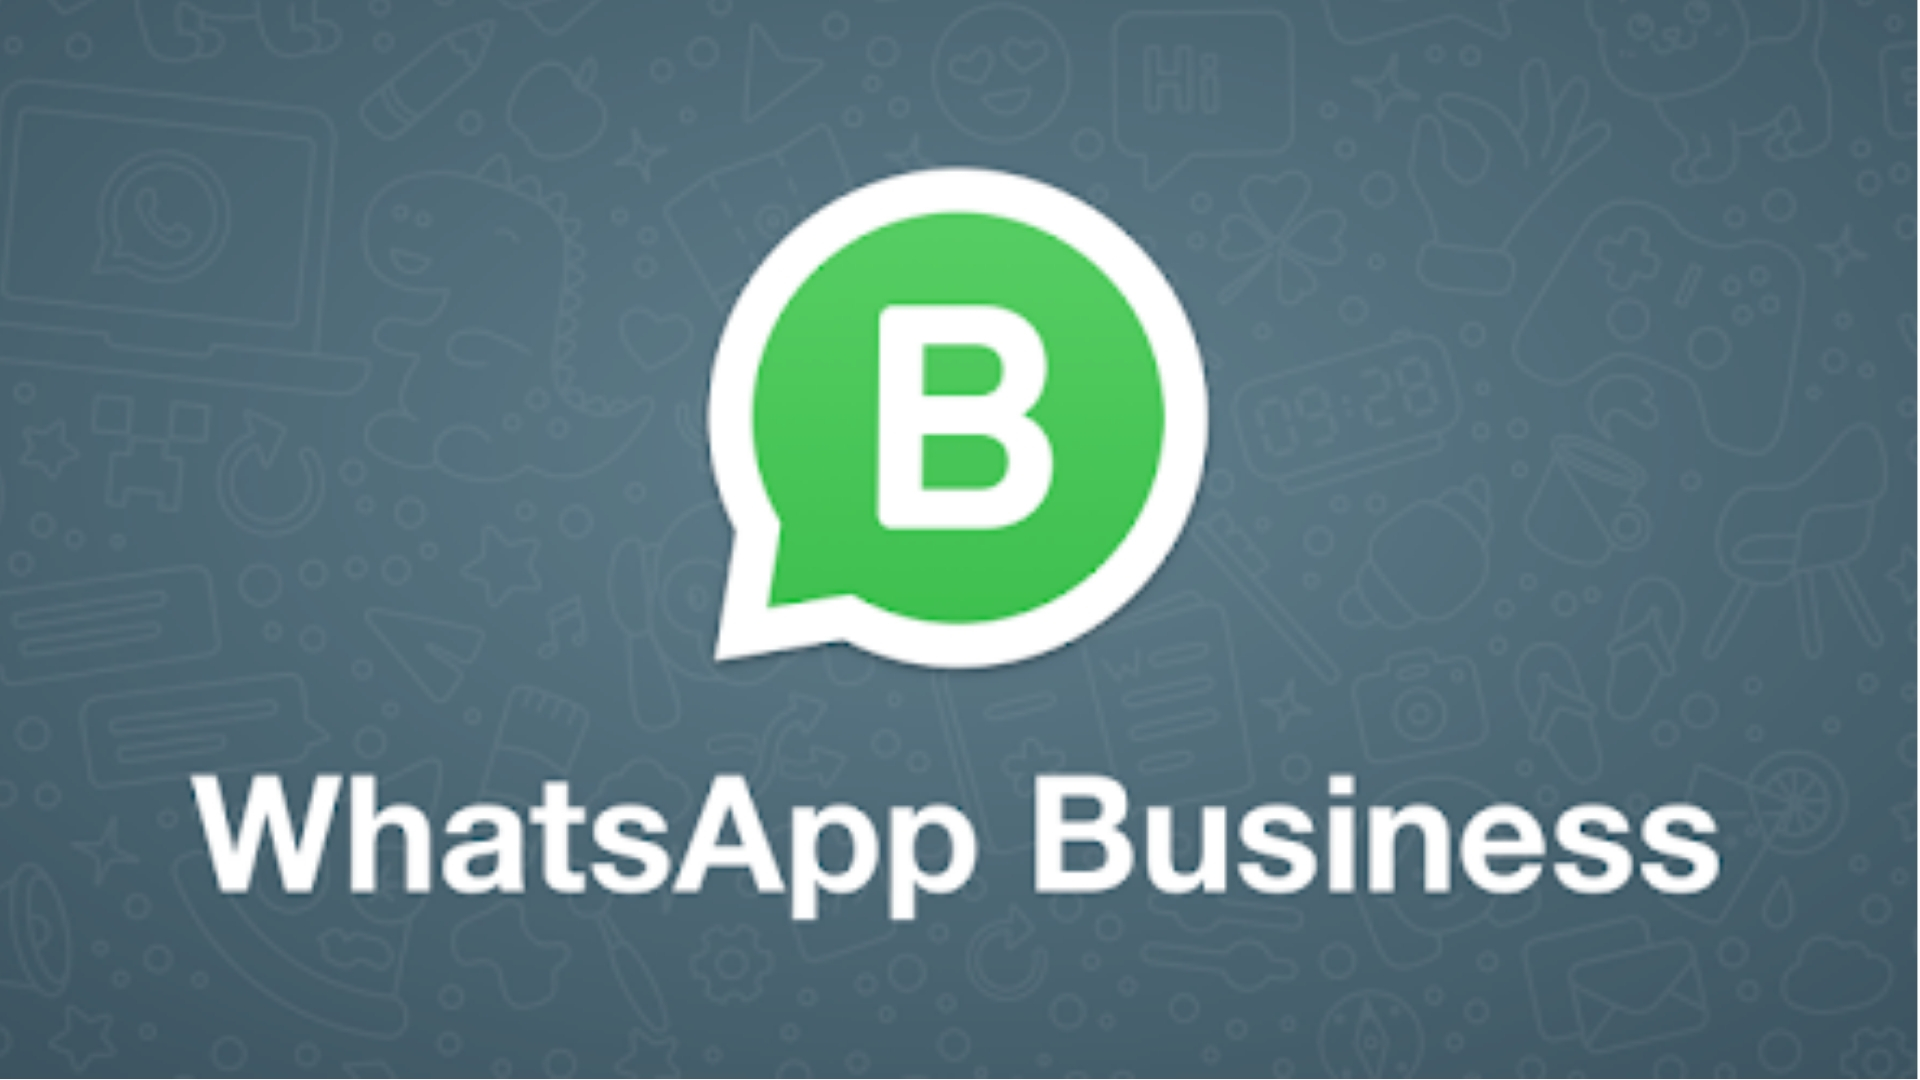 WhatsApp Bussiness - www.culturageek.com.ar